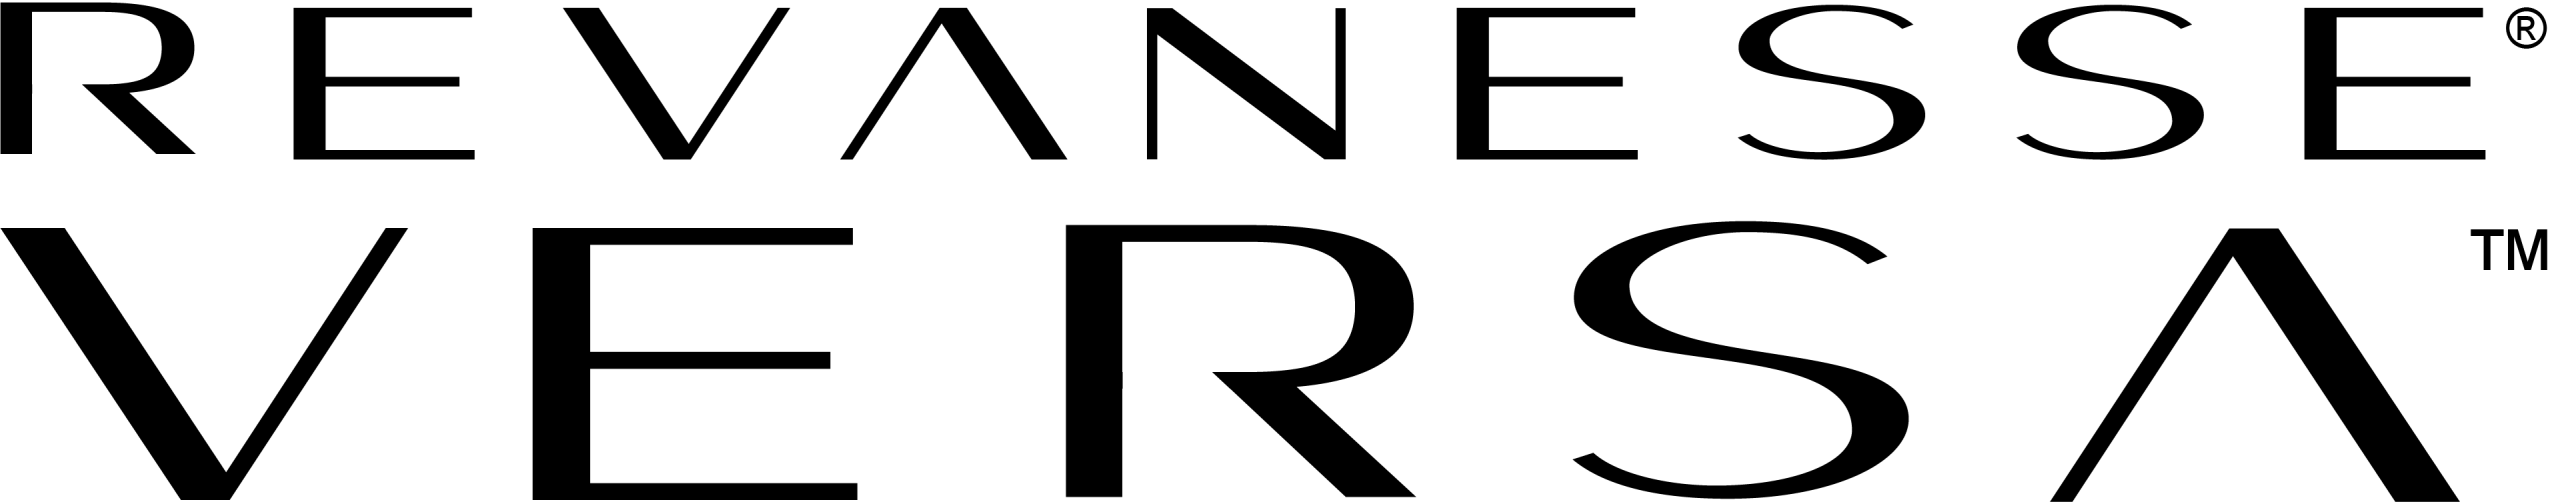 Revanesse logo